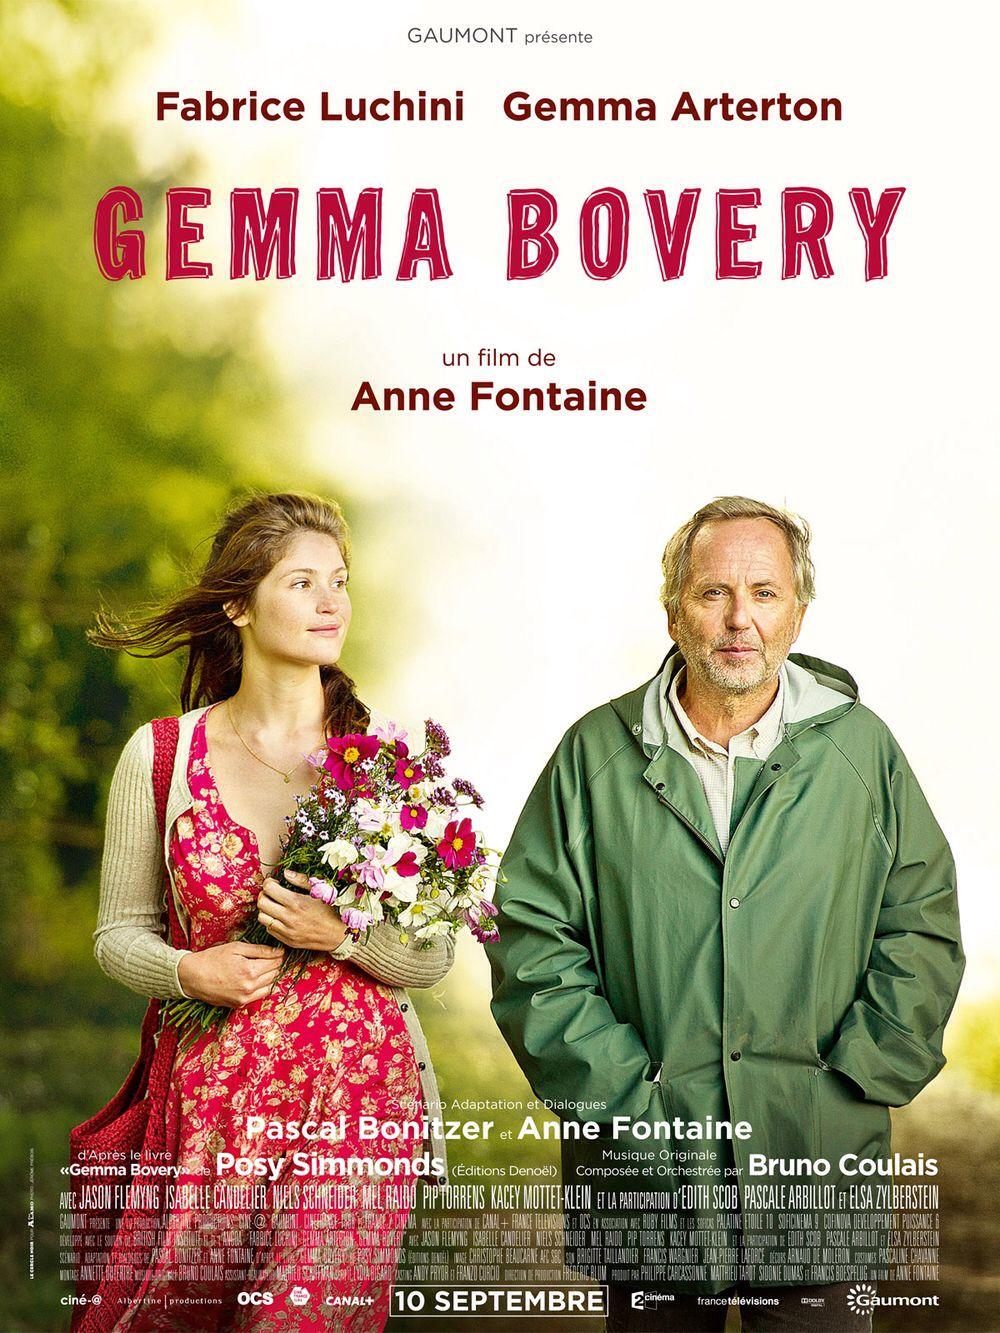 Gemma Bovery, un film d'Anne Fontaine (DVD) Film